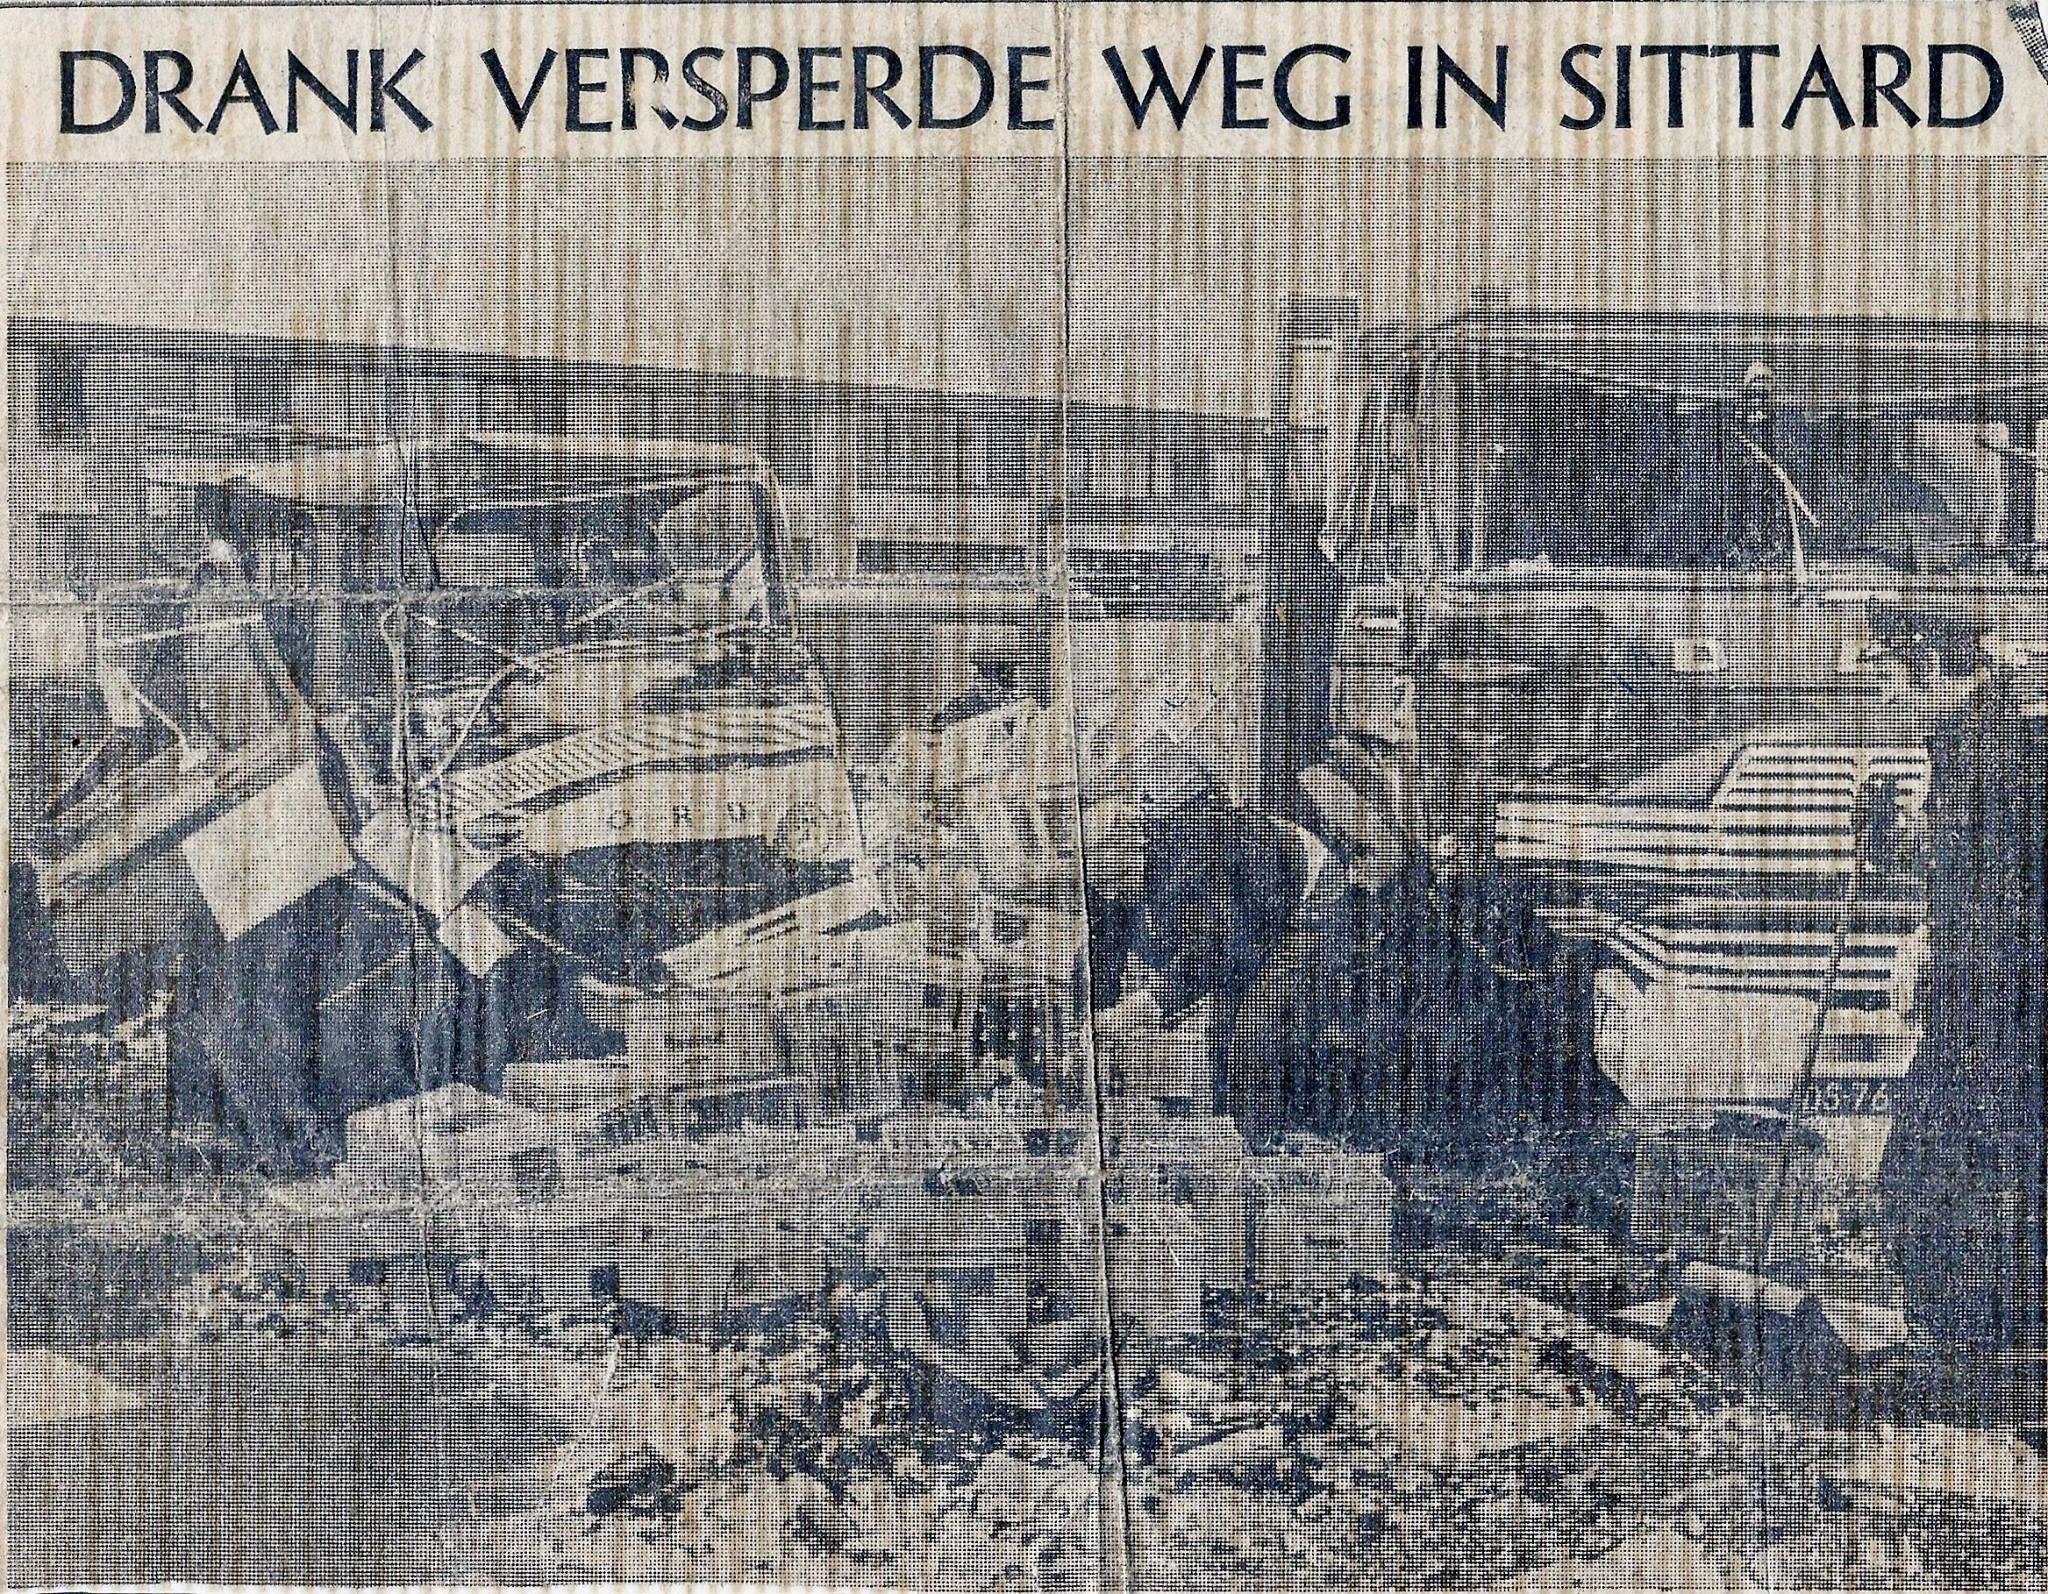 Daf-van-Selpa-Ford-van-Philippen-machinefabriek-Sittard-Menr-Ben-de-chauffeur-van-de-Ford